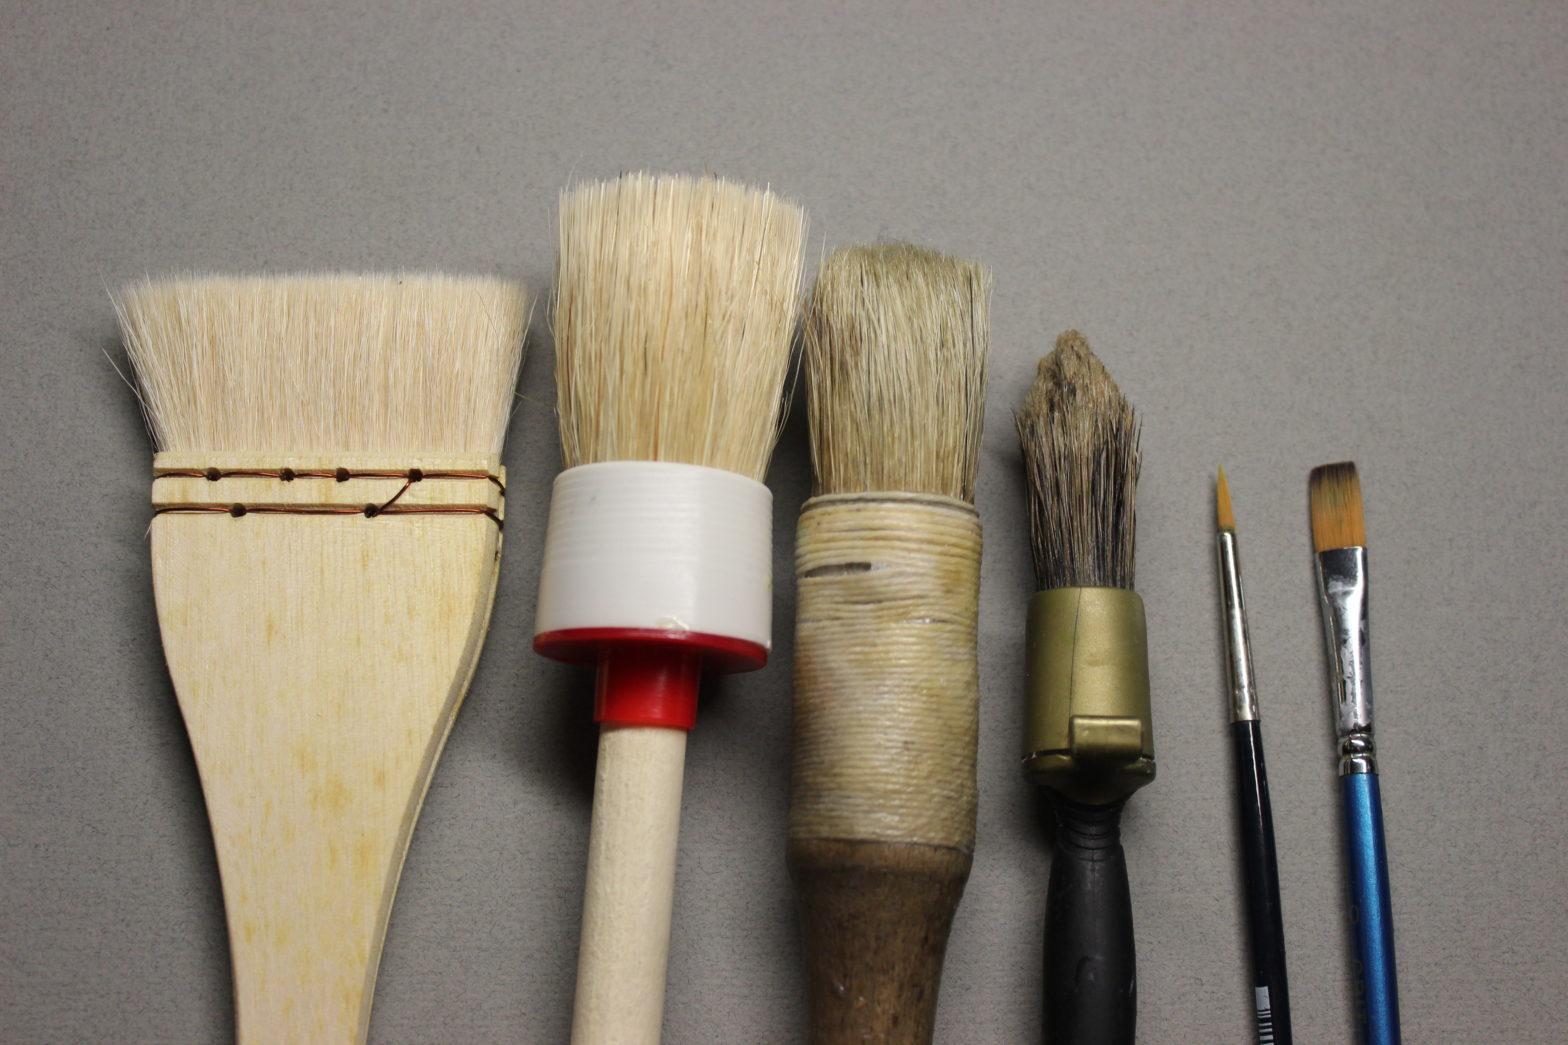 5 tipos de brochas para aplicar pegamento - Lettra